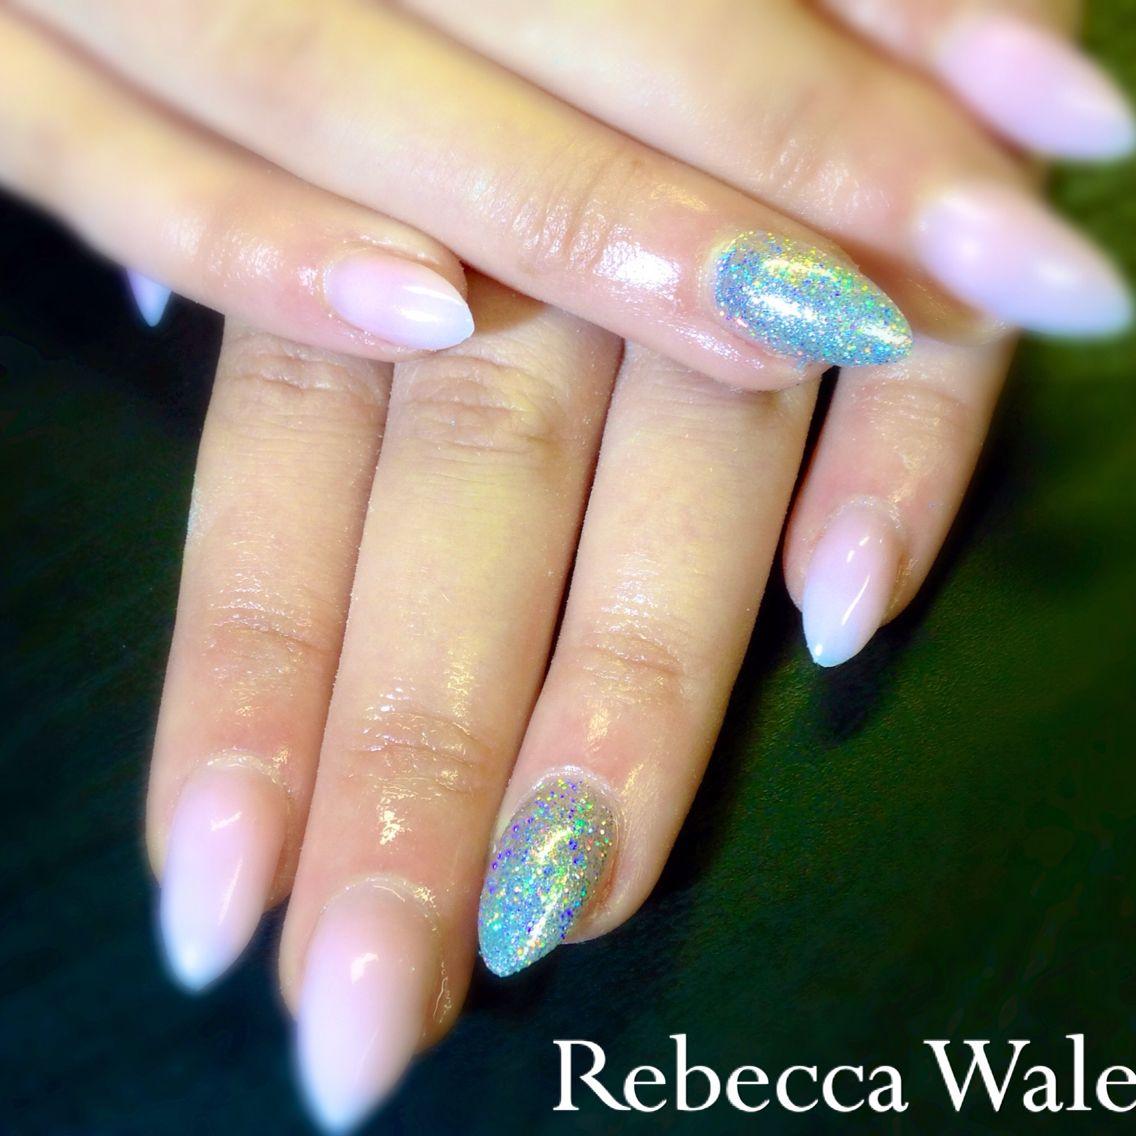 Acrylic Nails 2015 Nails Nails 2015 Acrylic Nails